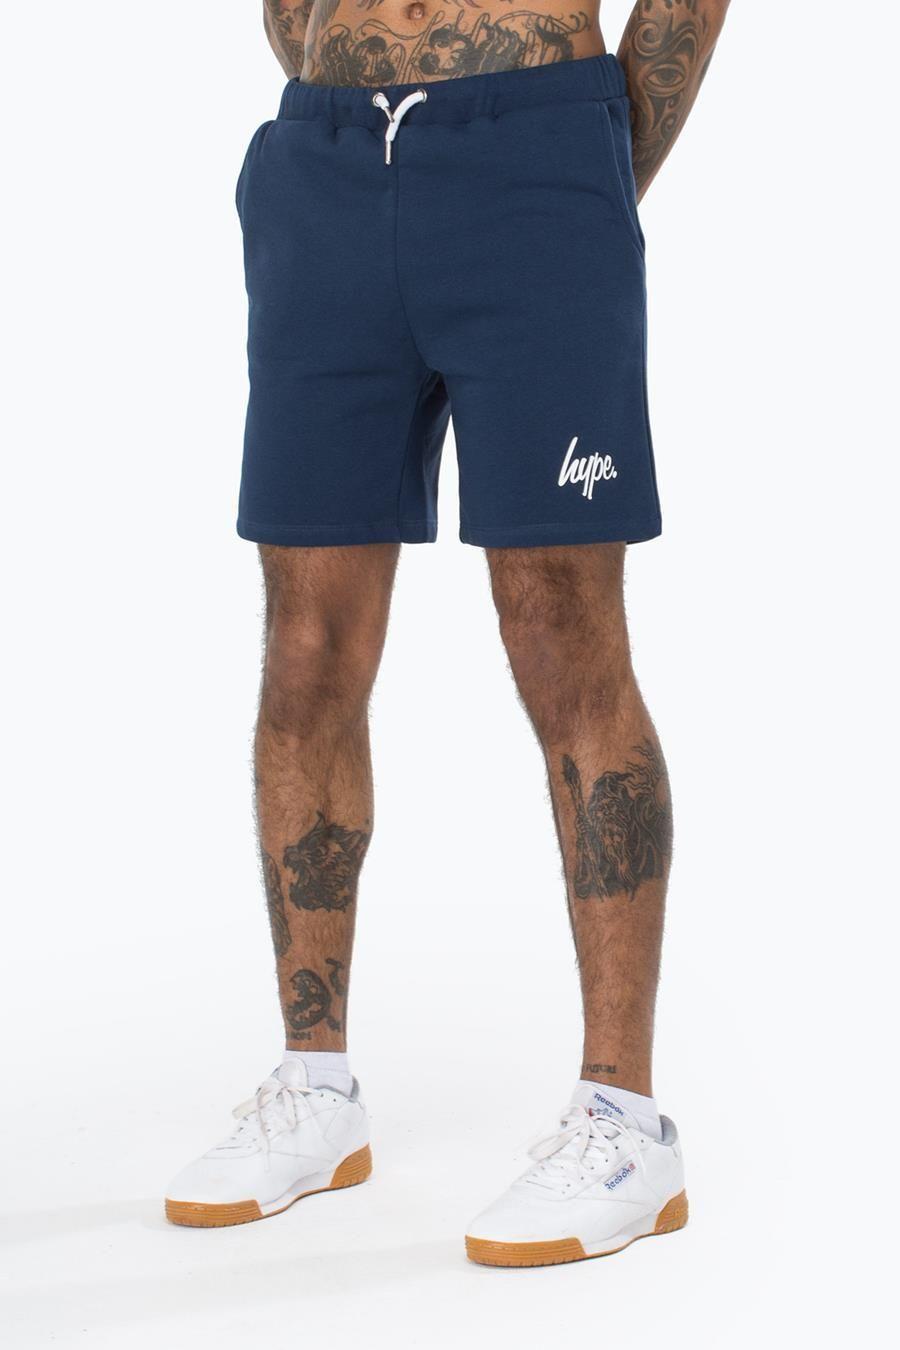 Hype Navy Script Mens Shorts